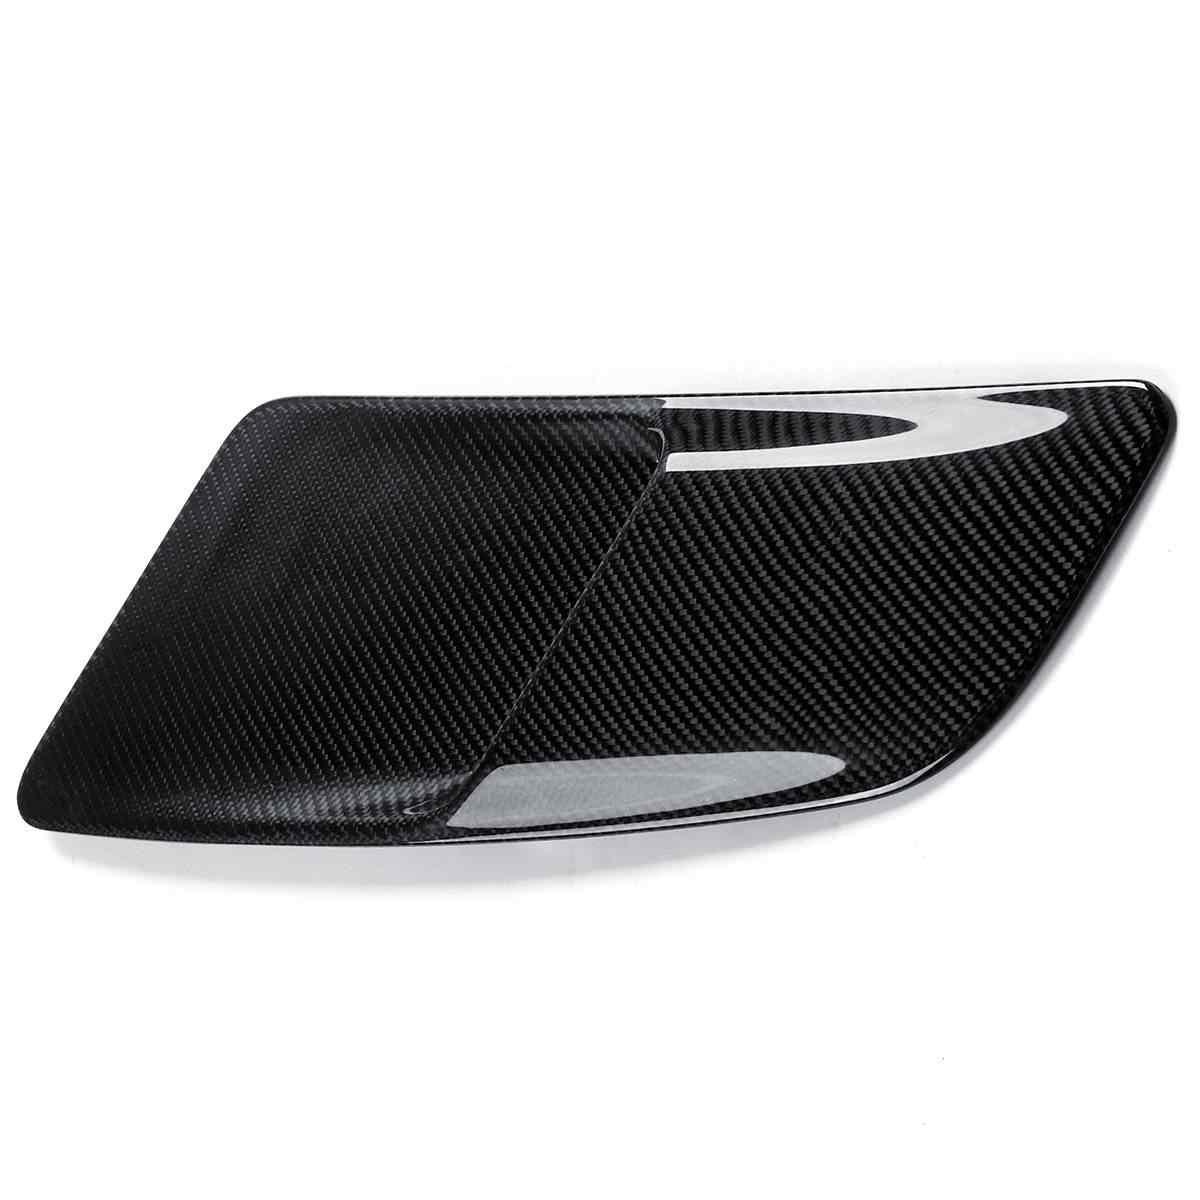 2x3 K Углеродное волокно Автомобильная Передняя вентиляция в капоте s для Ford для Mustang 2015-2017 автомобильный воздухозаборник капот с воздухозаборником вентиляция в капоте 5432